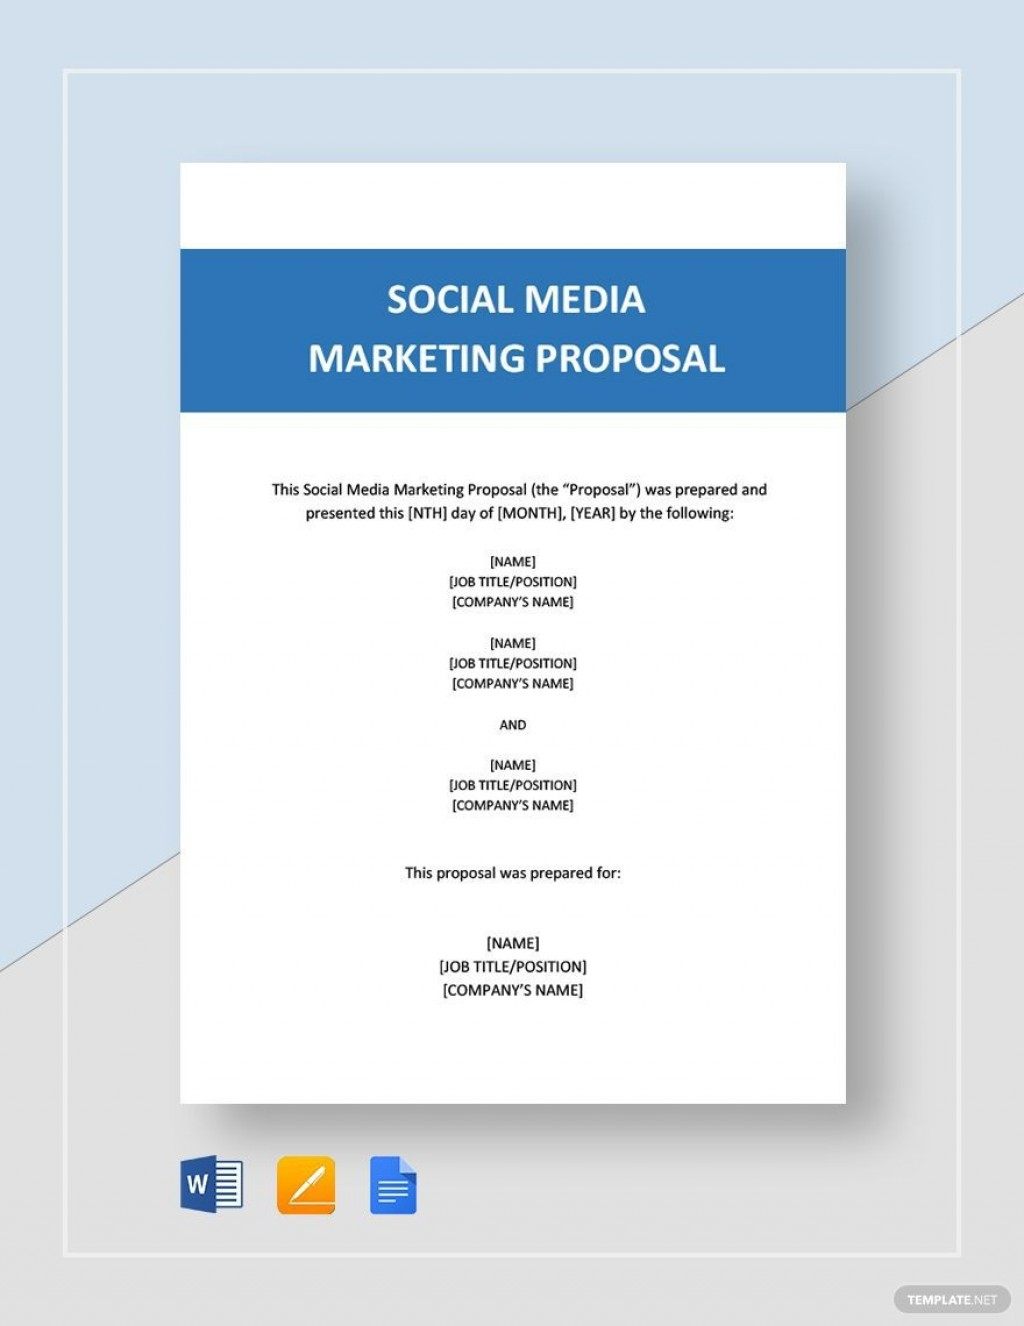 004 Unforgettable Social Media Marketing Proposal Template Word Design  PlanLarge